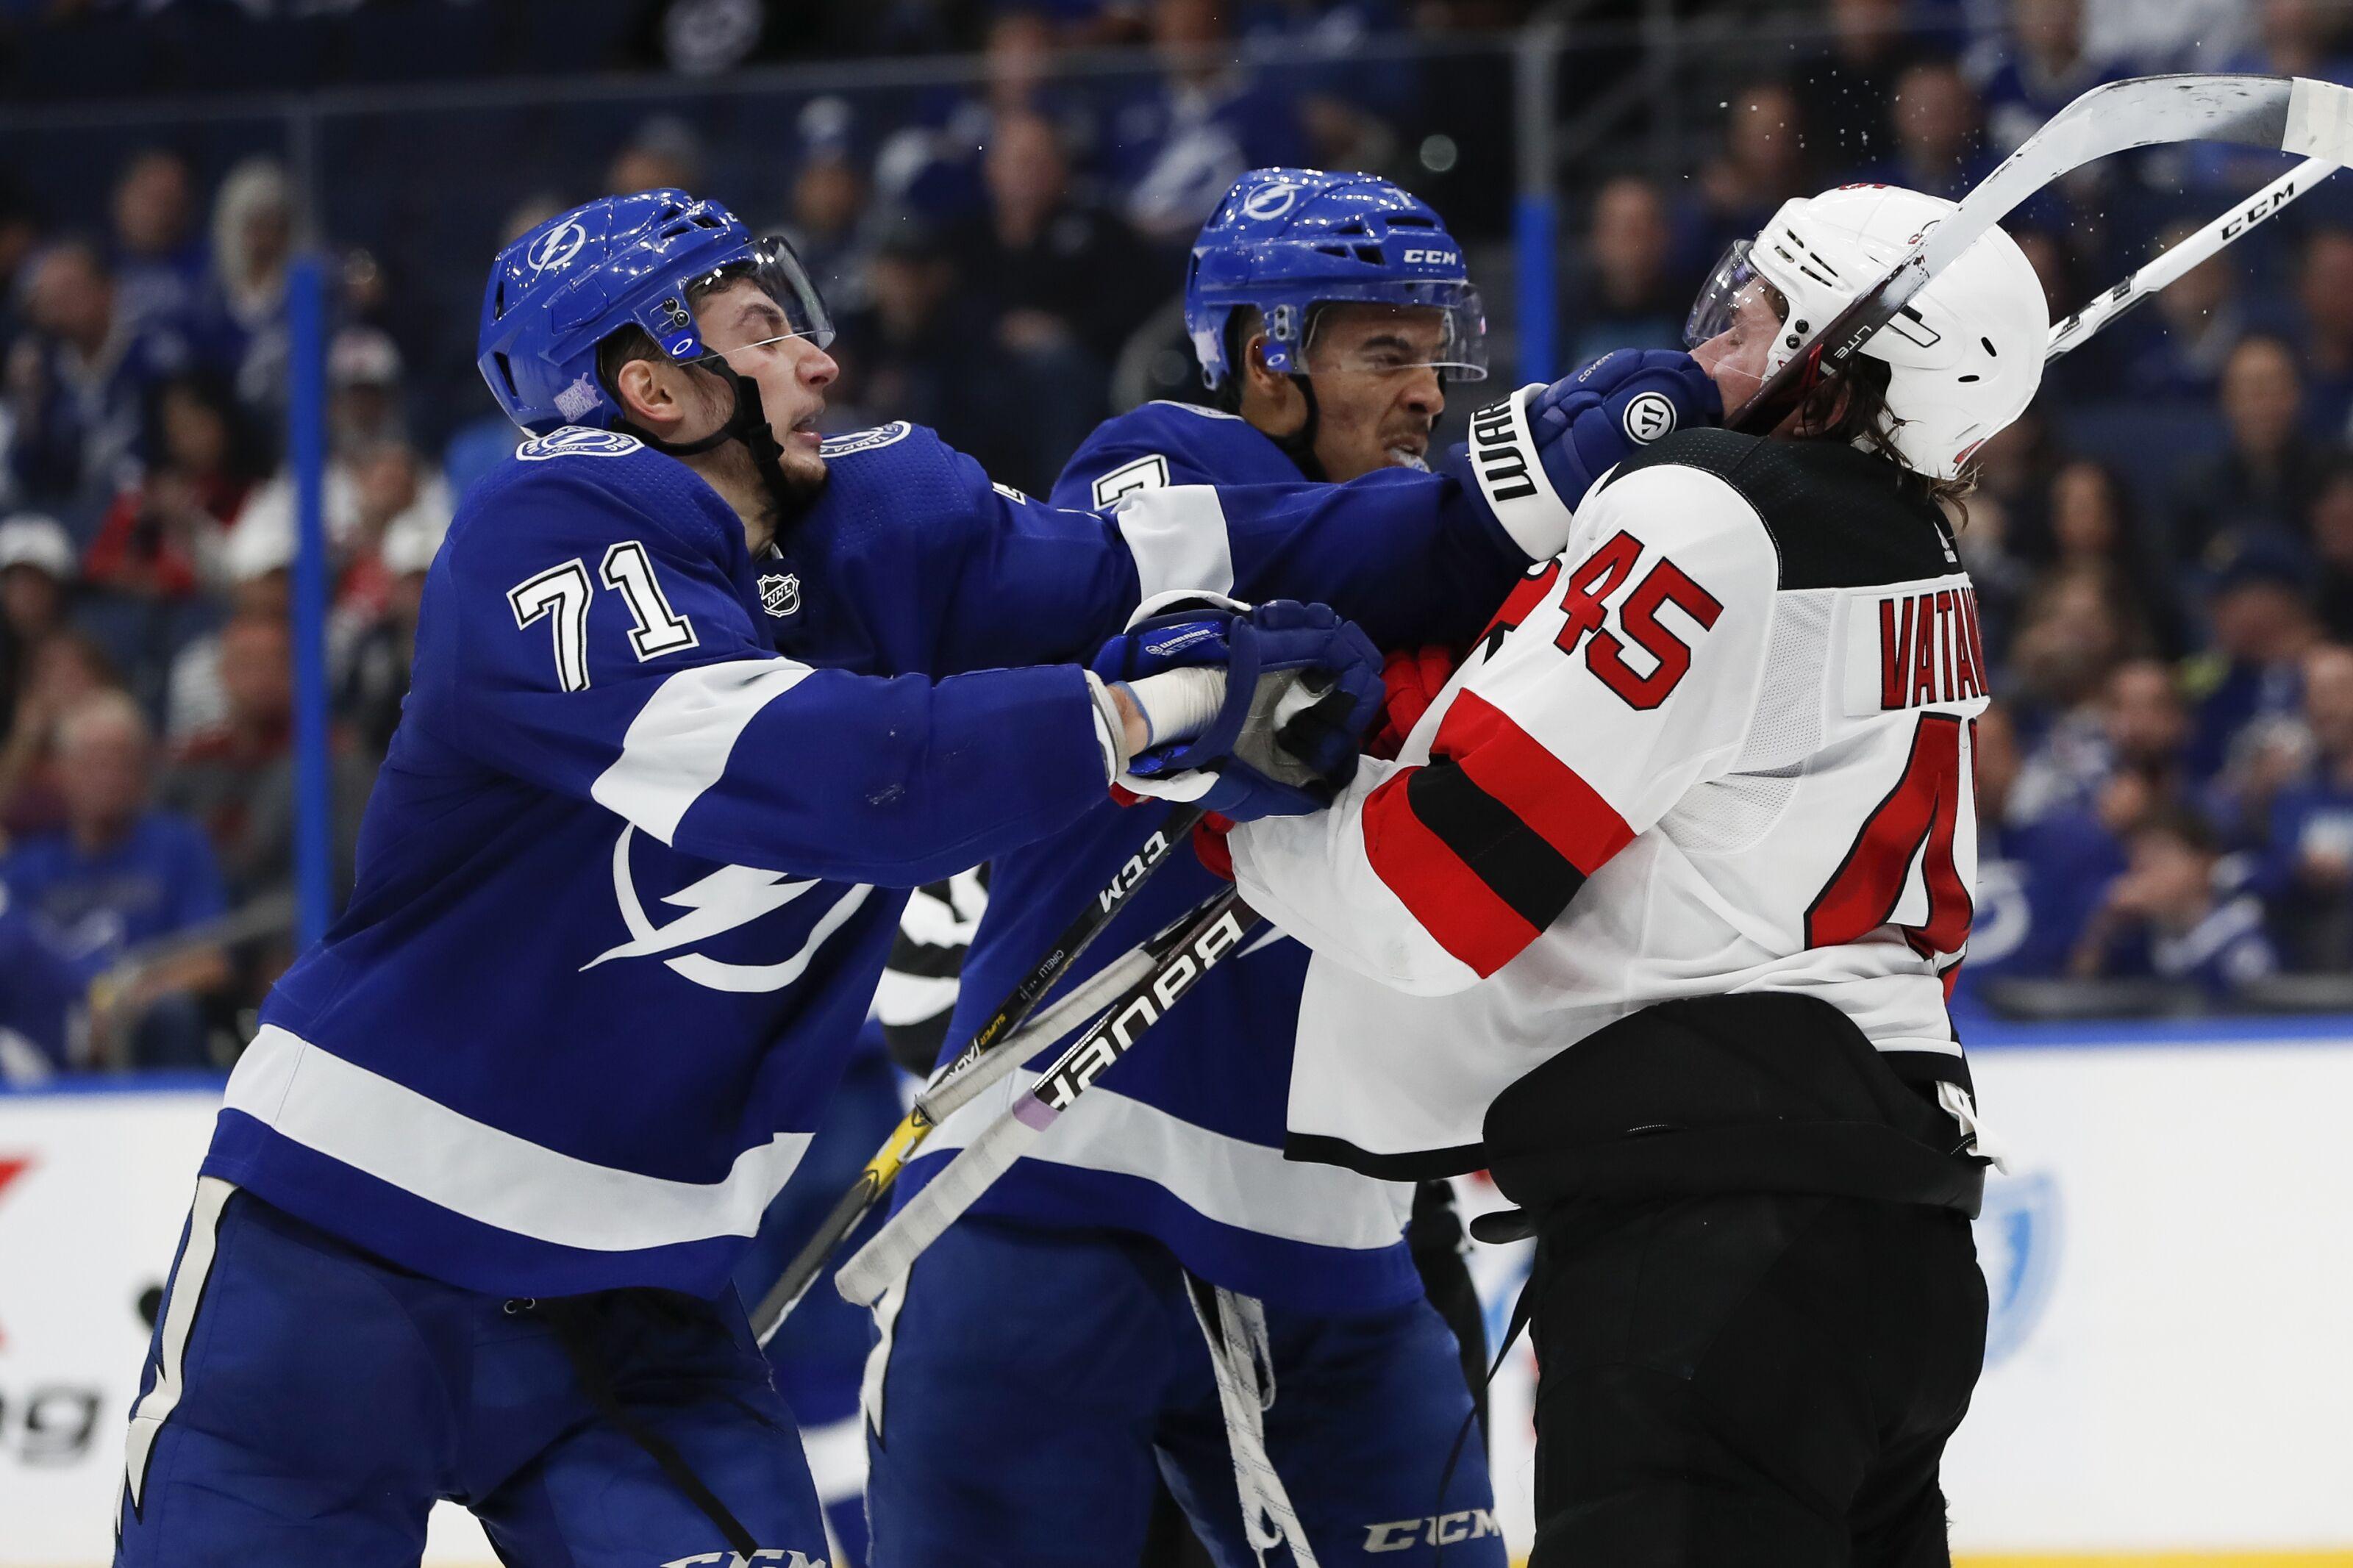 Should the New Jersey Devils Consider Moving Sami Vatanen?